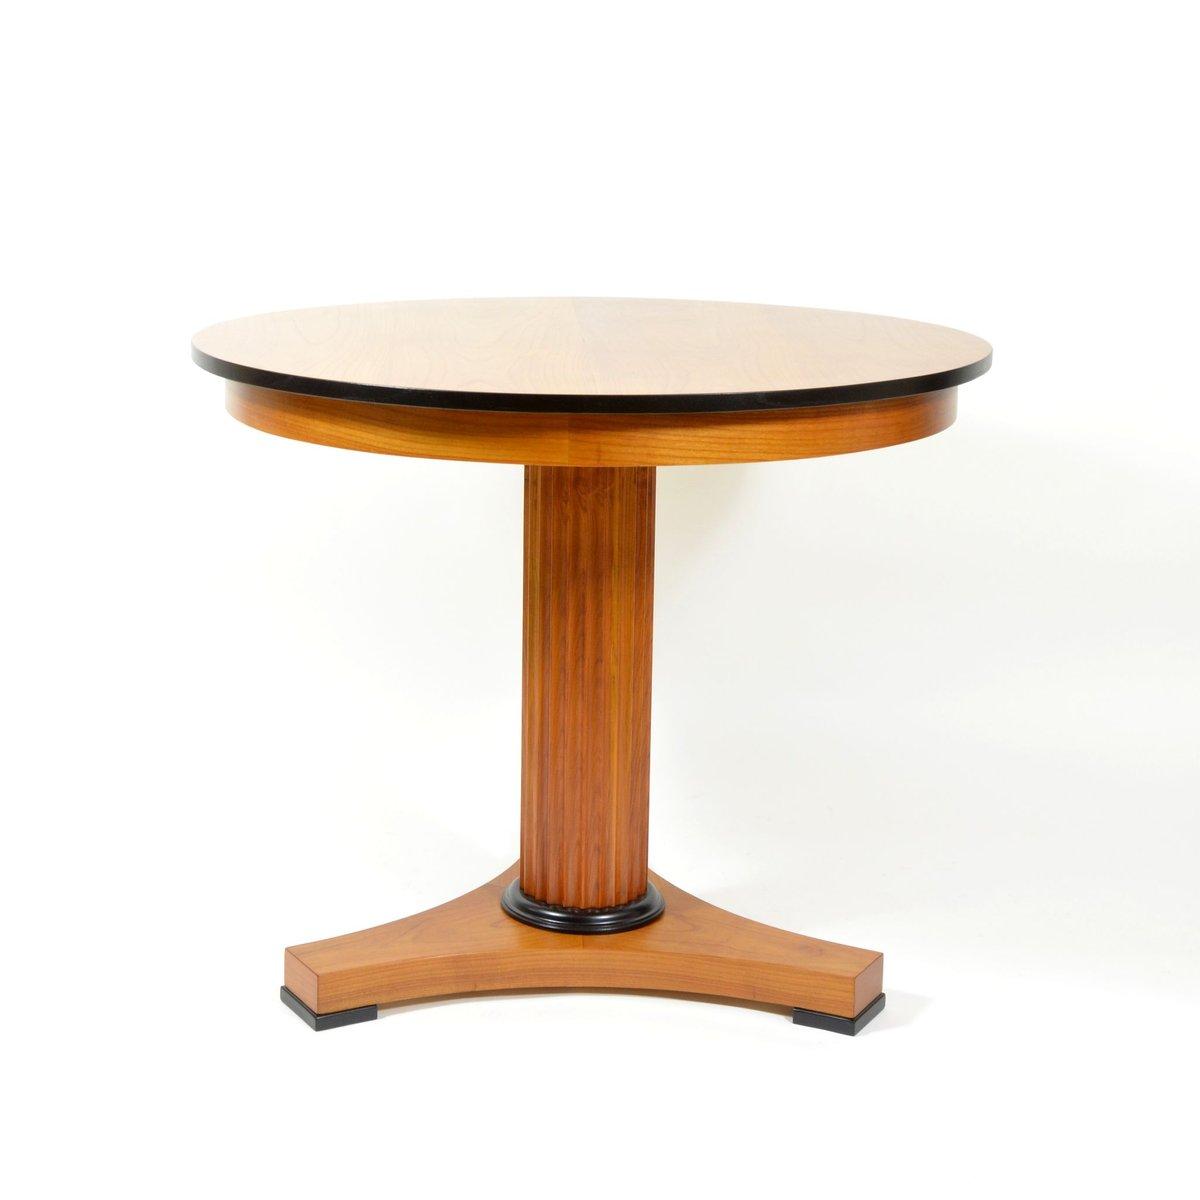 table de salon en merisier 1920s en vente sur pamono. Black Bedroom Furniture Sets. Home Design Ideas